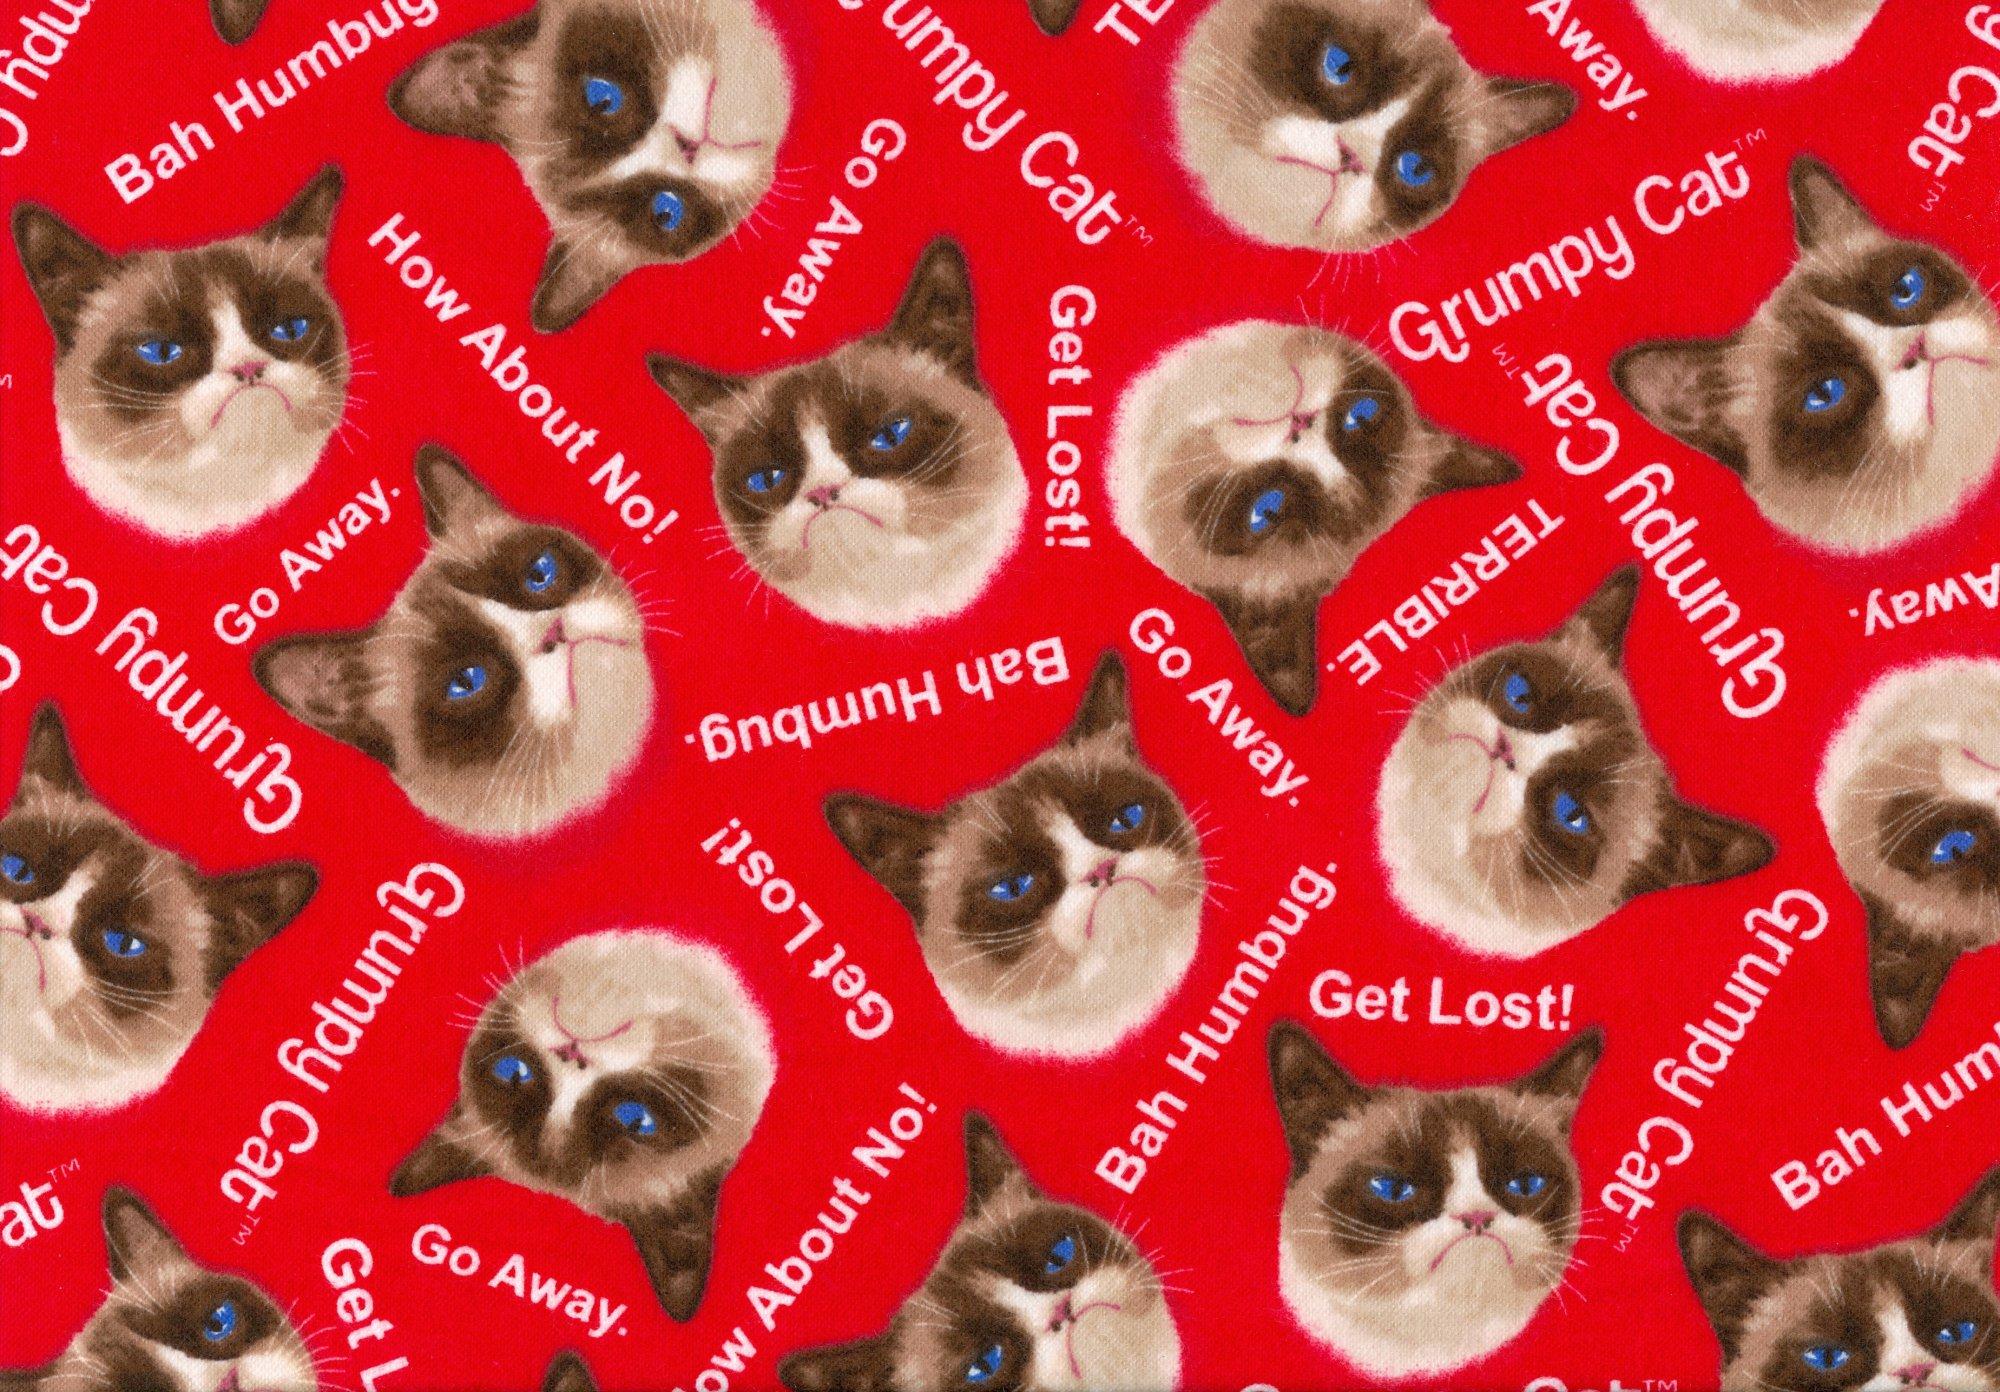 Grumpy Cat Flannel - 9722-0211 - Red FLANNEL